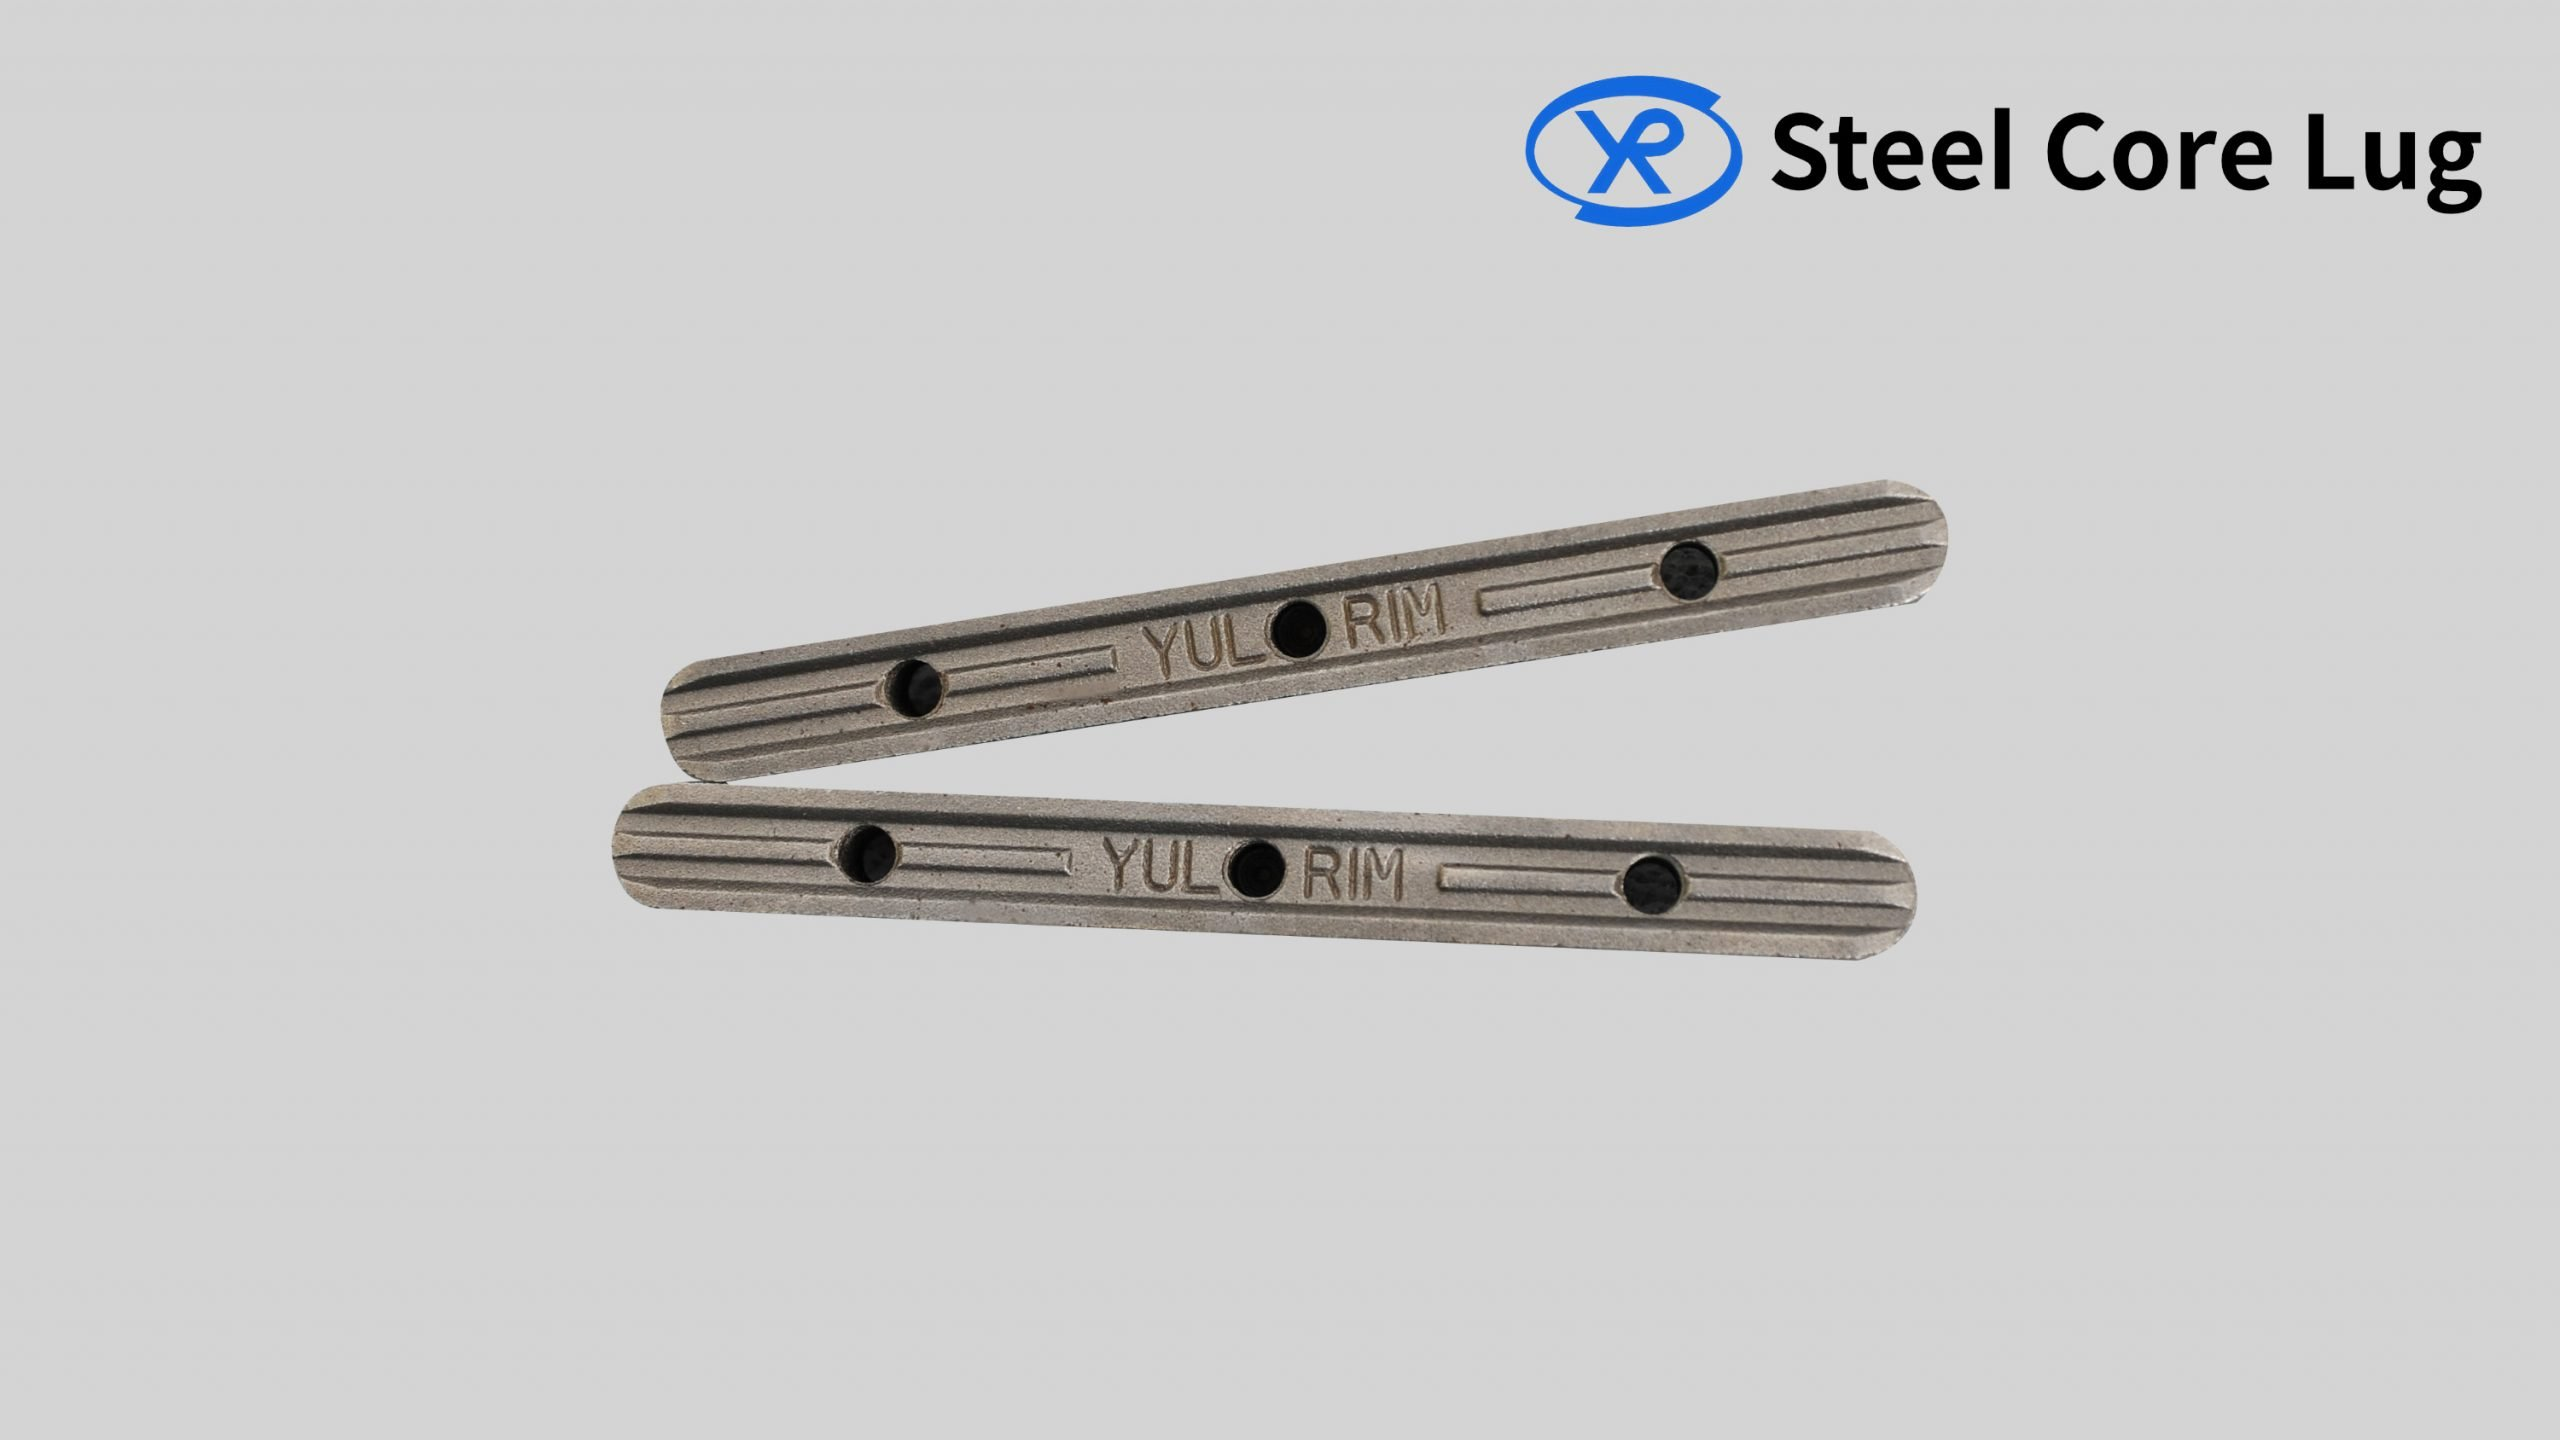 Lug-for-Steel-core